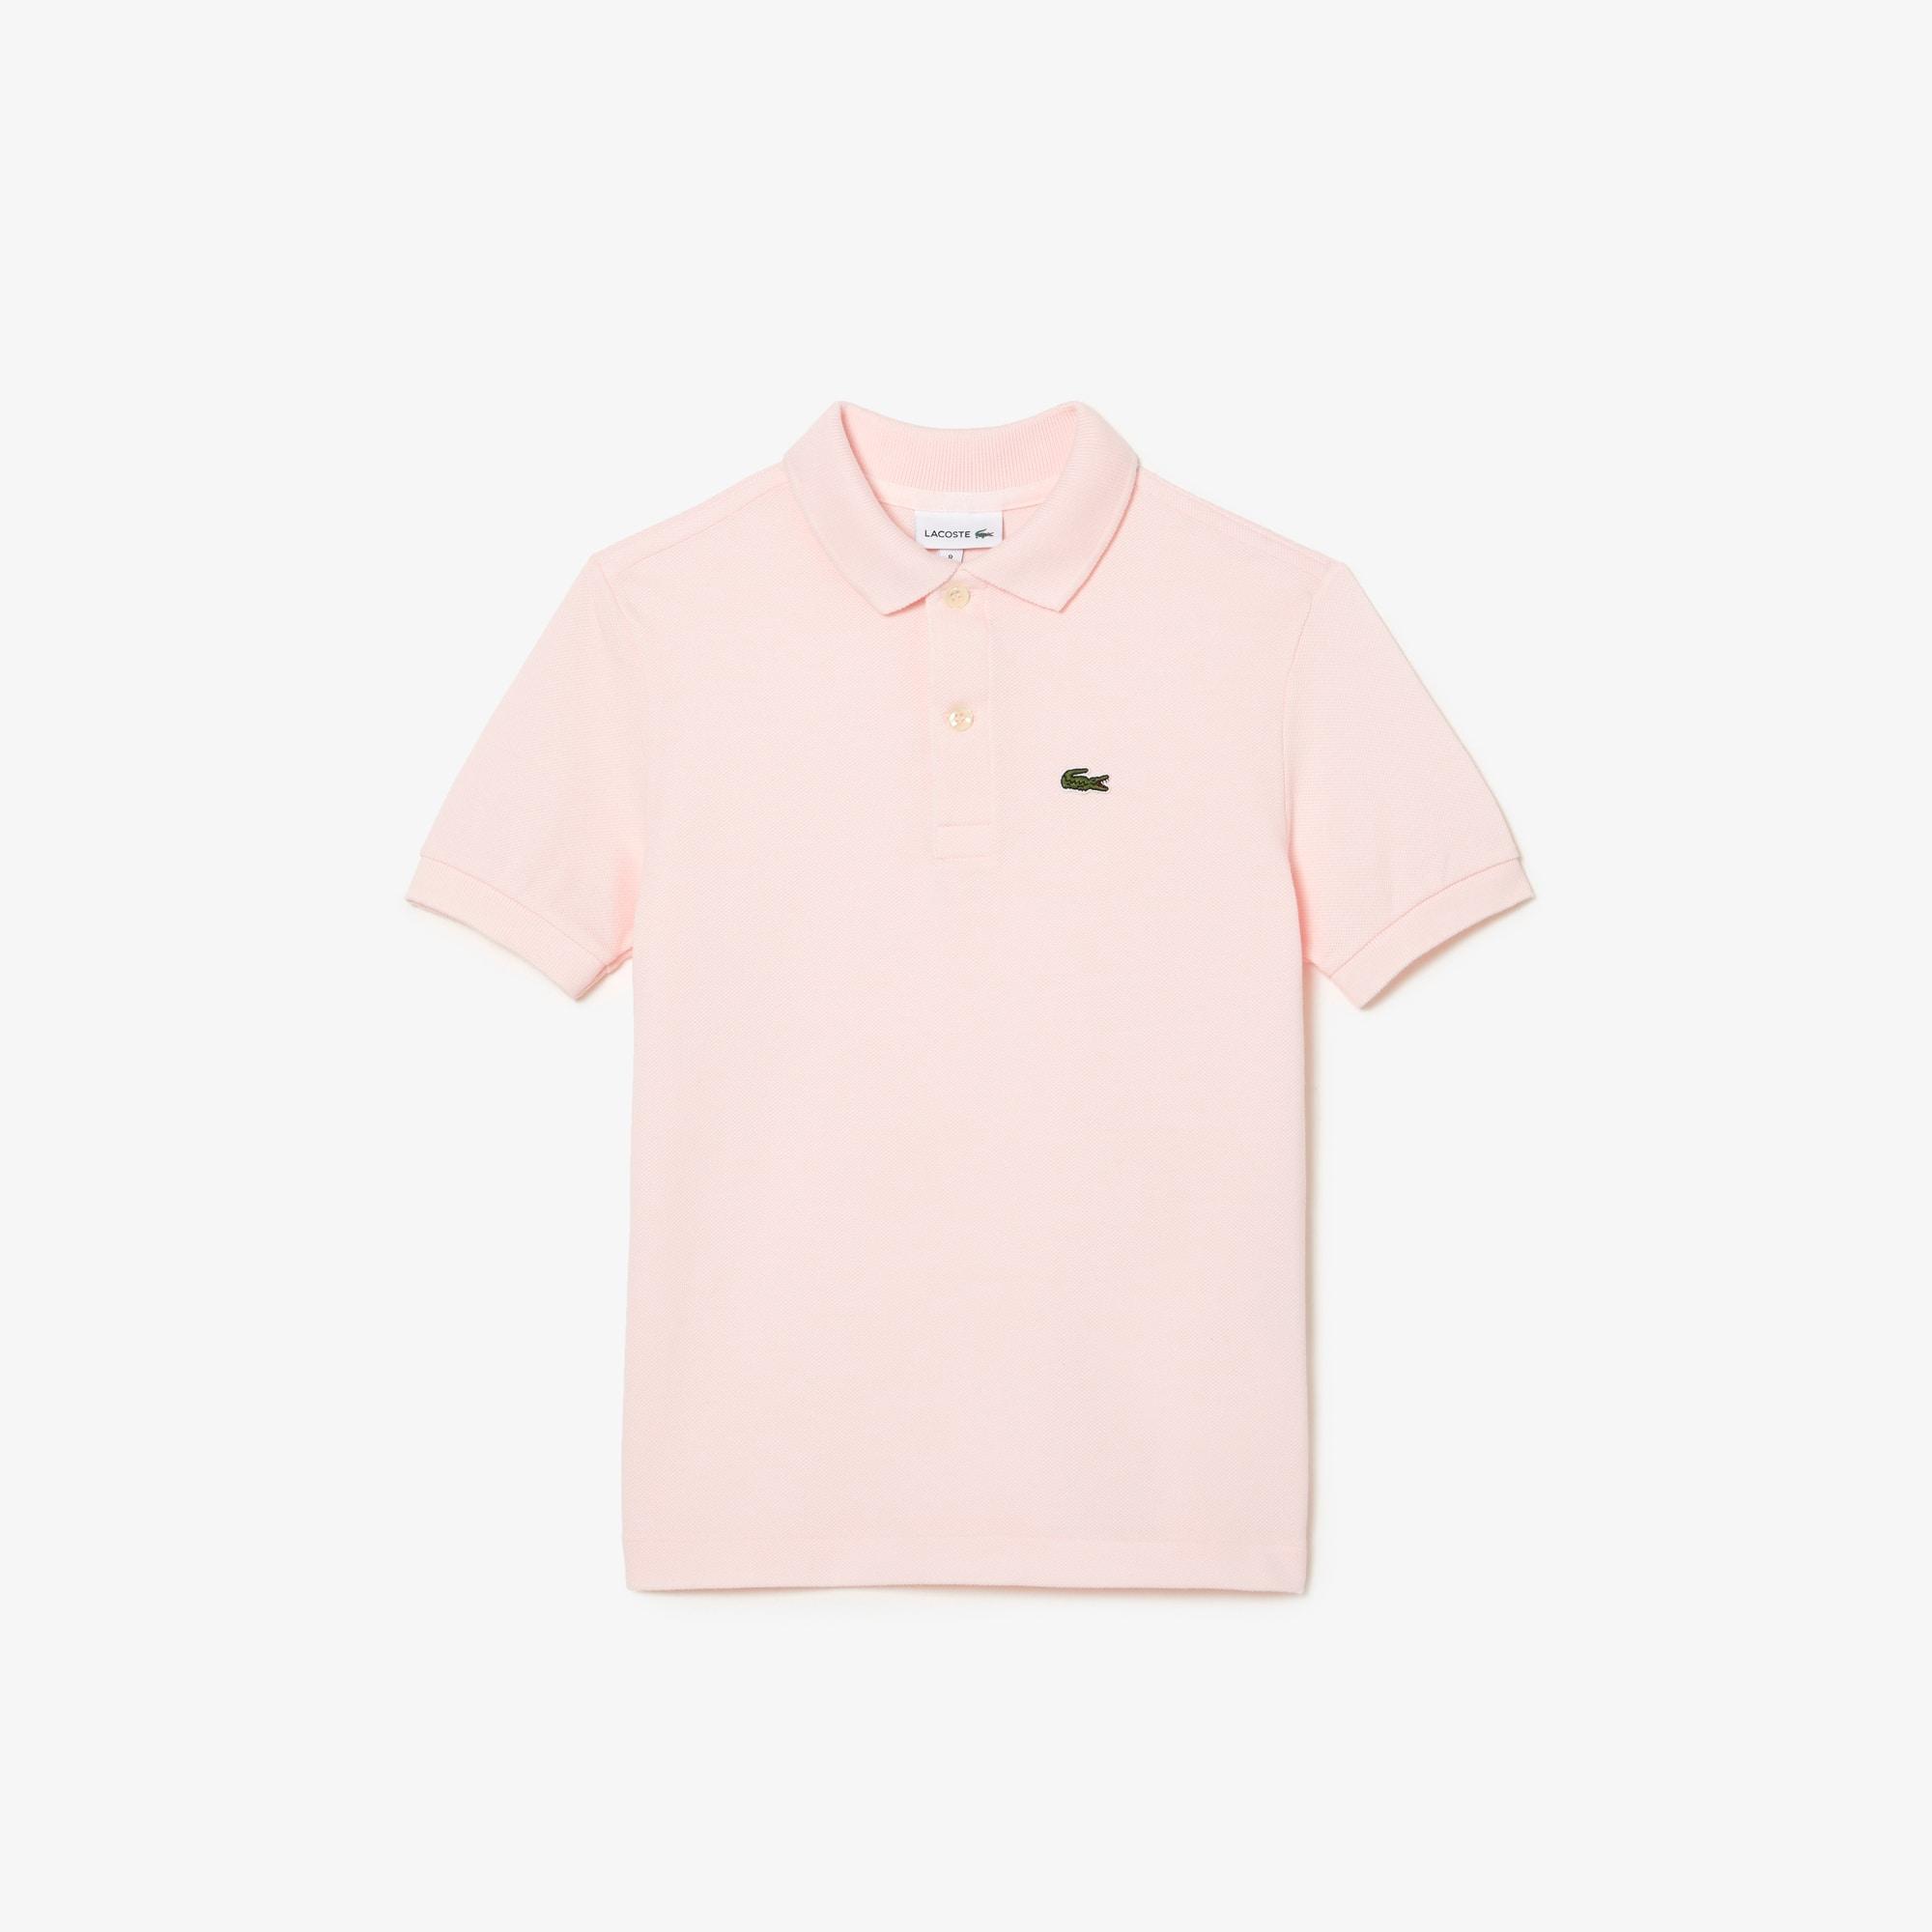 cd1b82e13 Lacoste Petit Piqué Polo Shirt ...